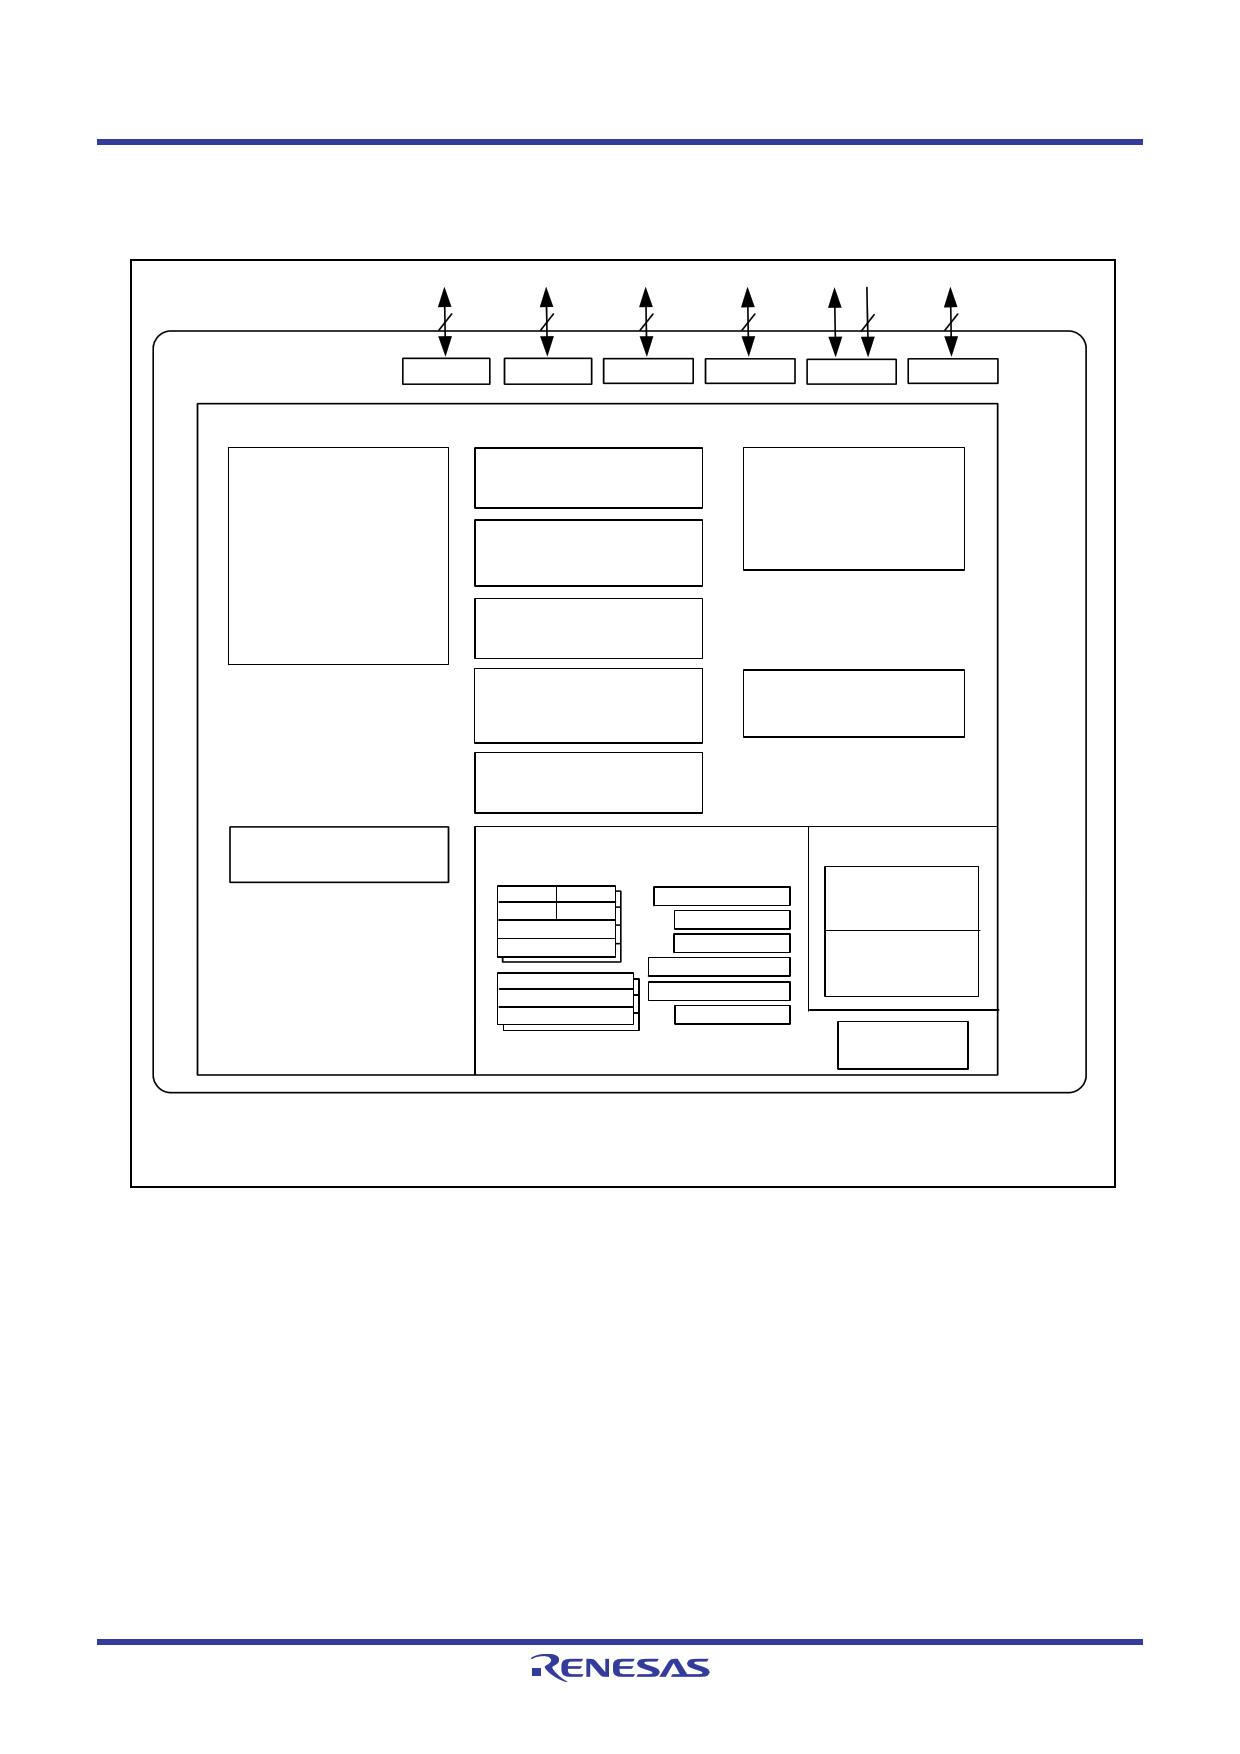 R5F21238KFP pdf, 반도체, 판매, 대치품